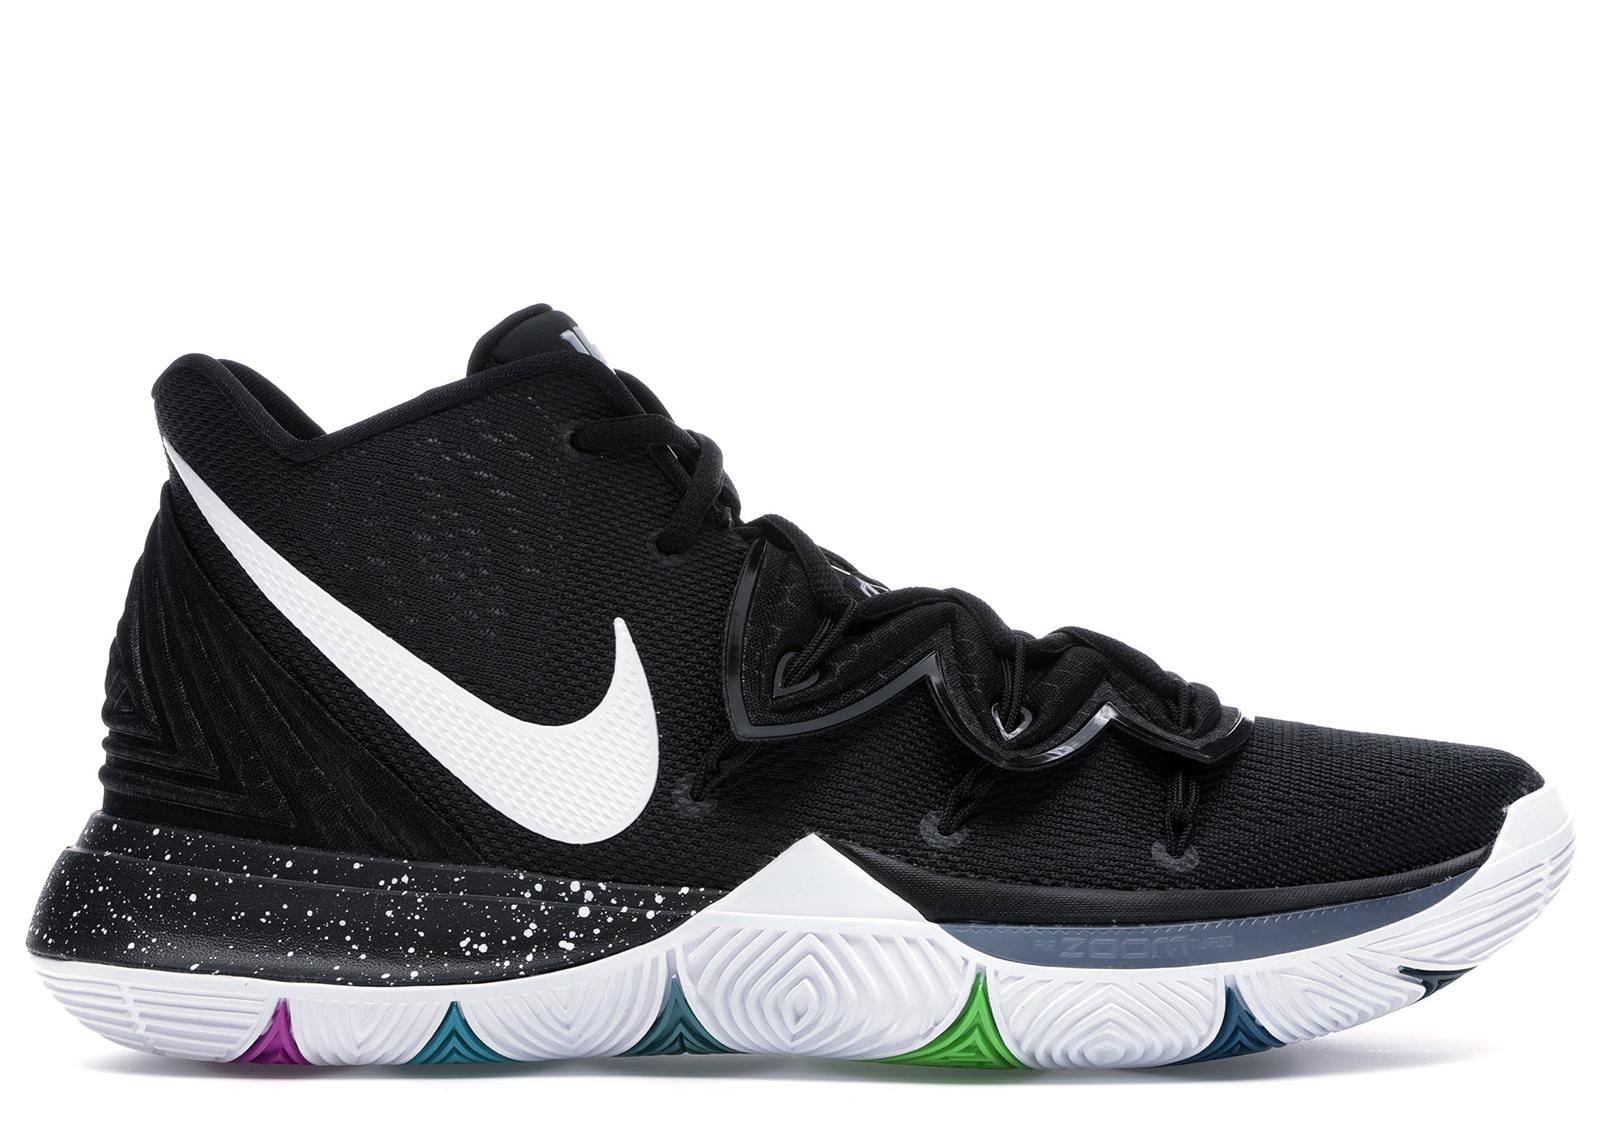 Nike Kyrie 5 Black Magic - AO2919-901